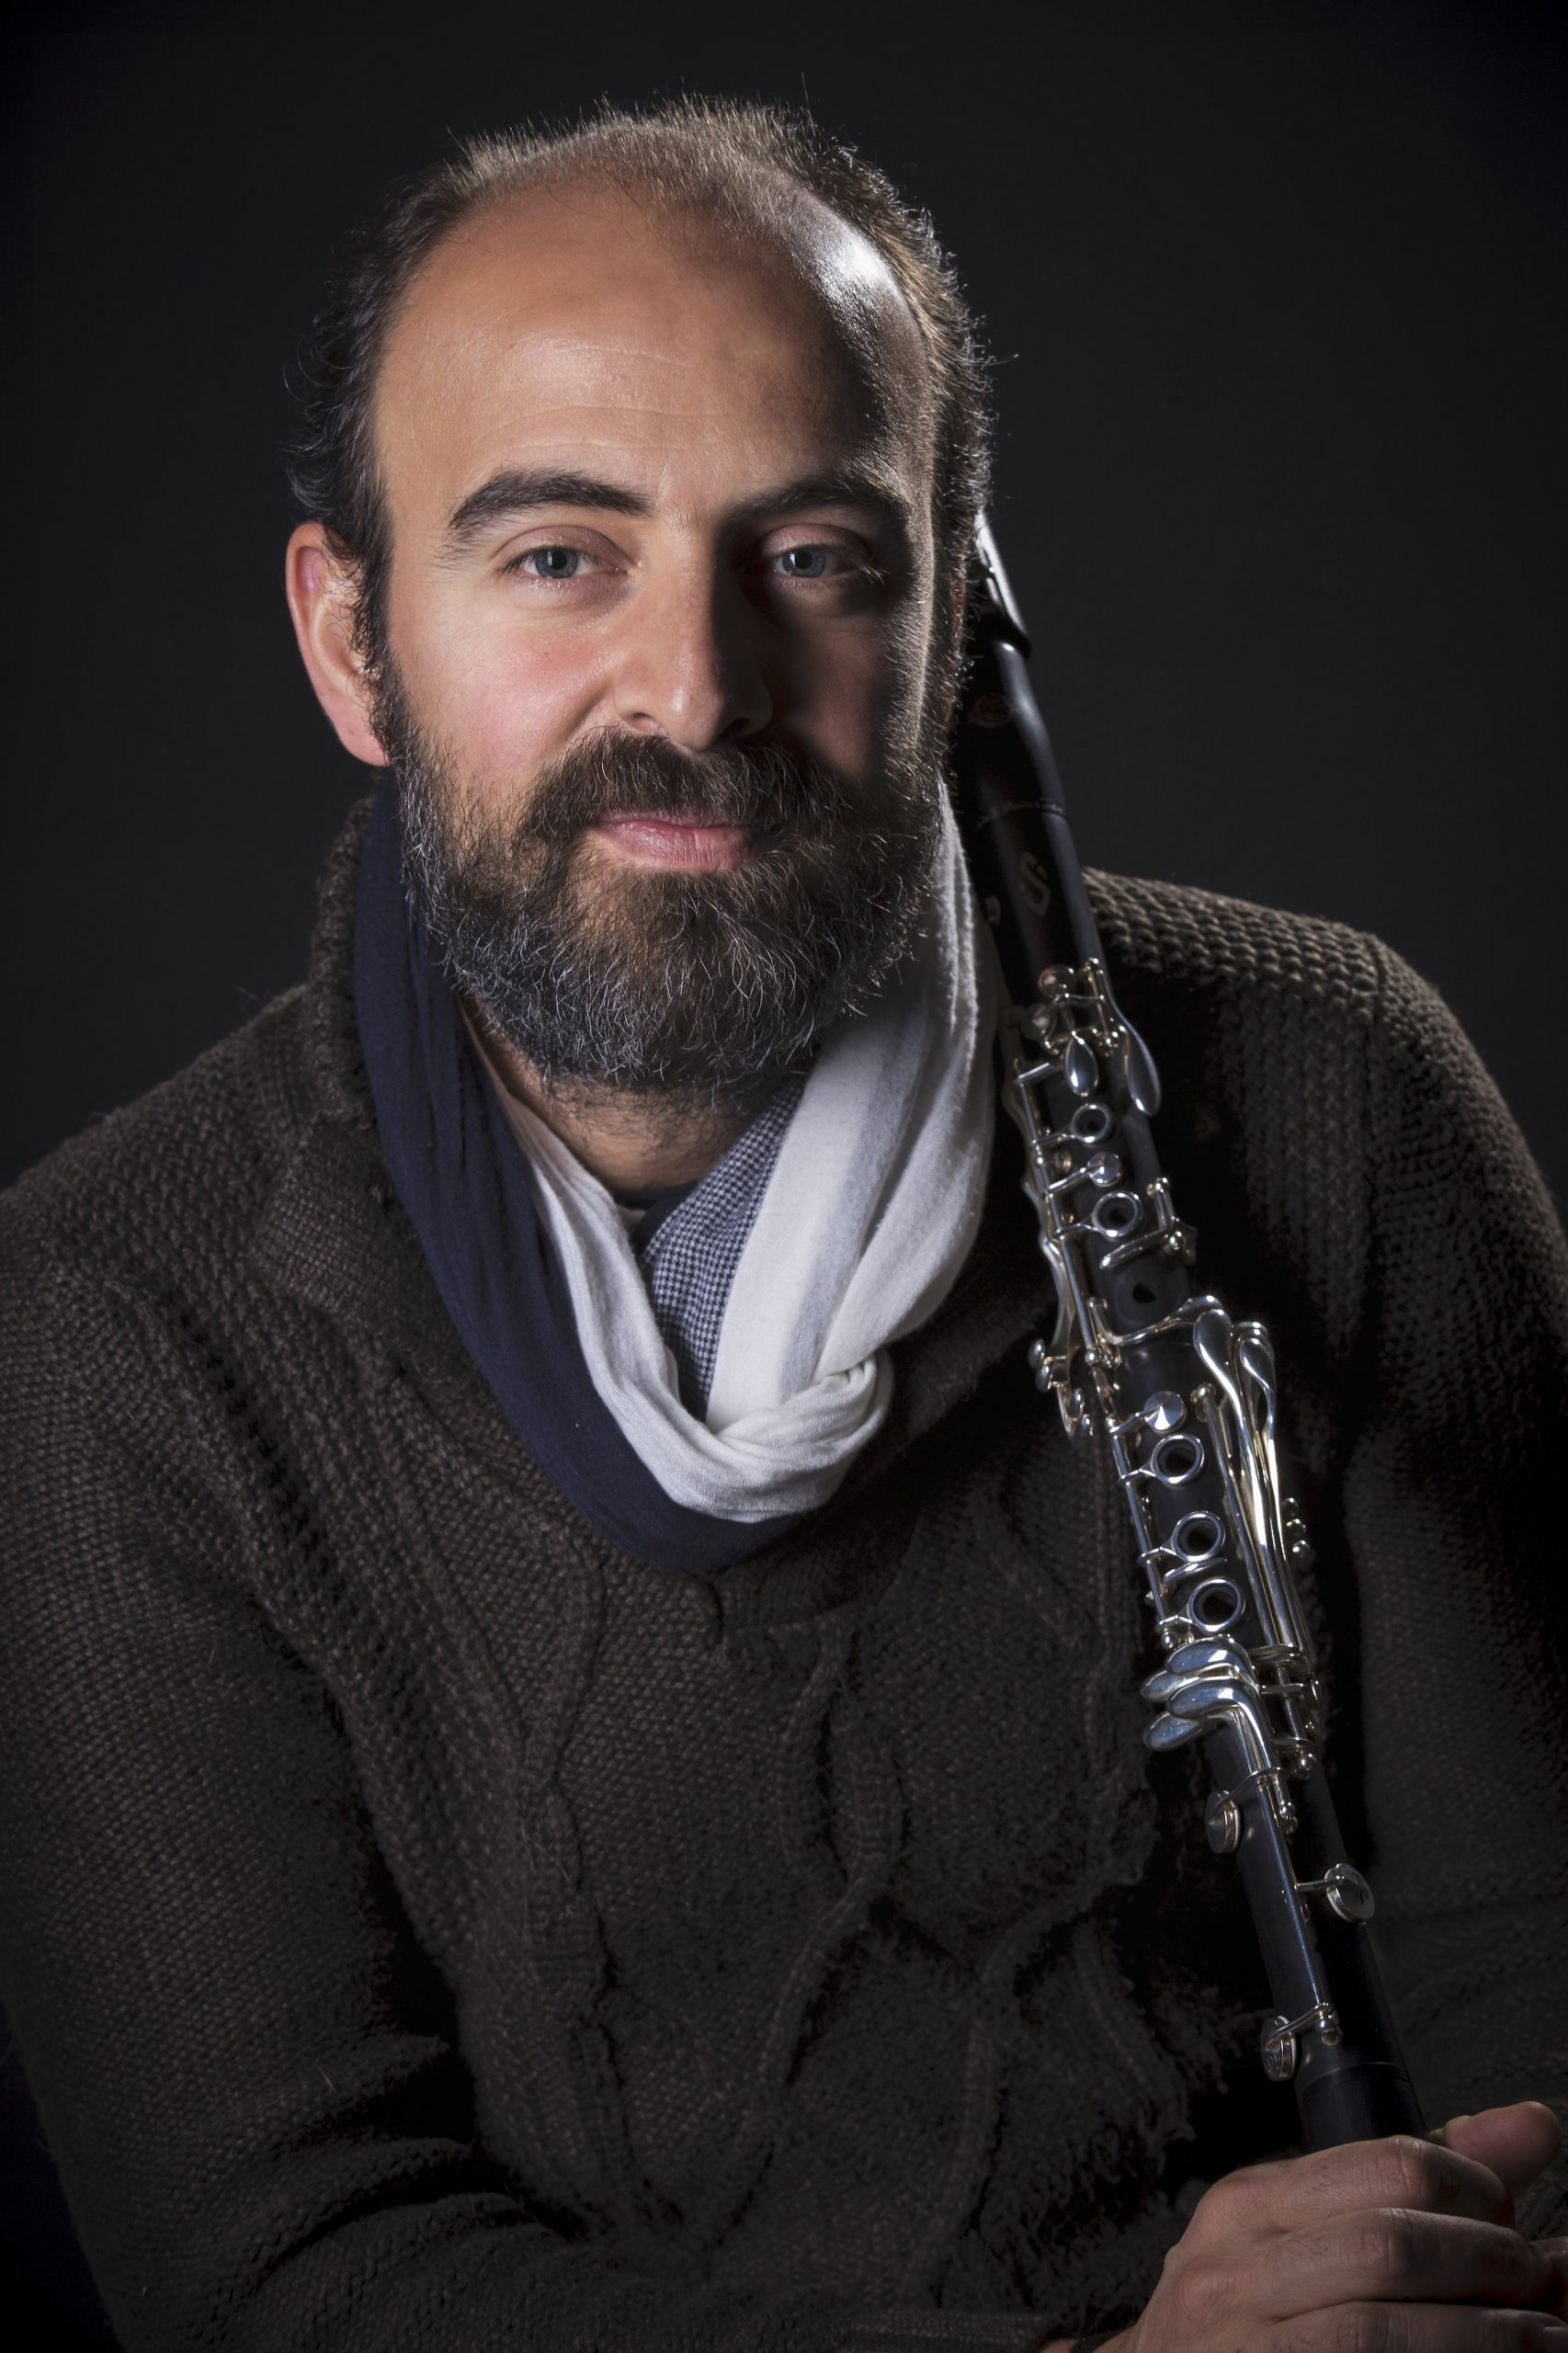 Kinan-Azmeh-Press-photo-profile